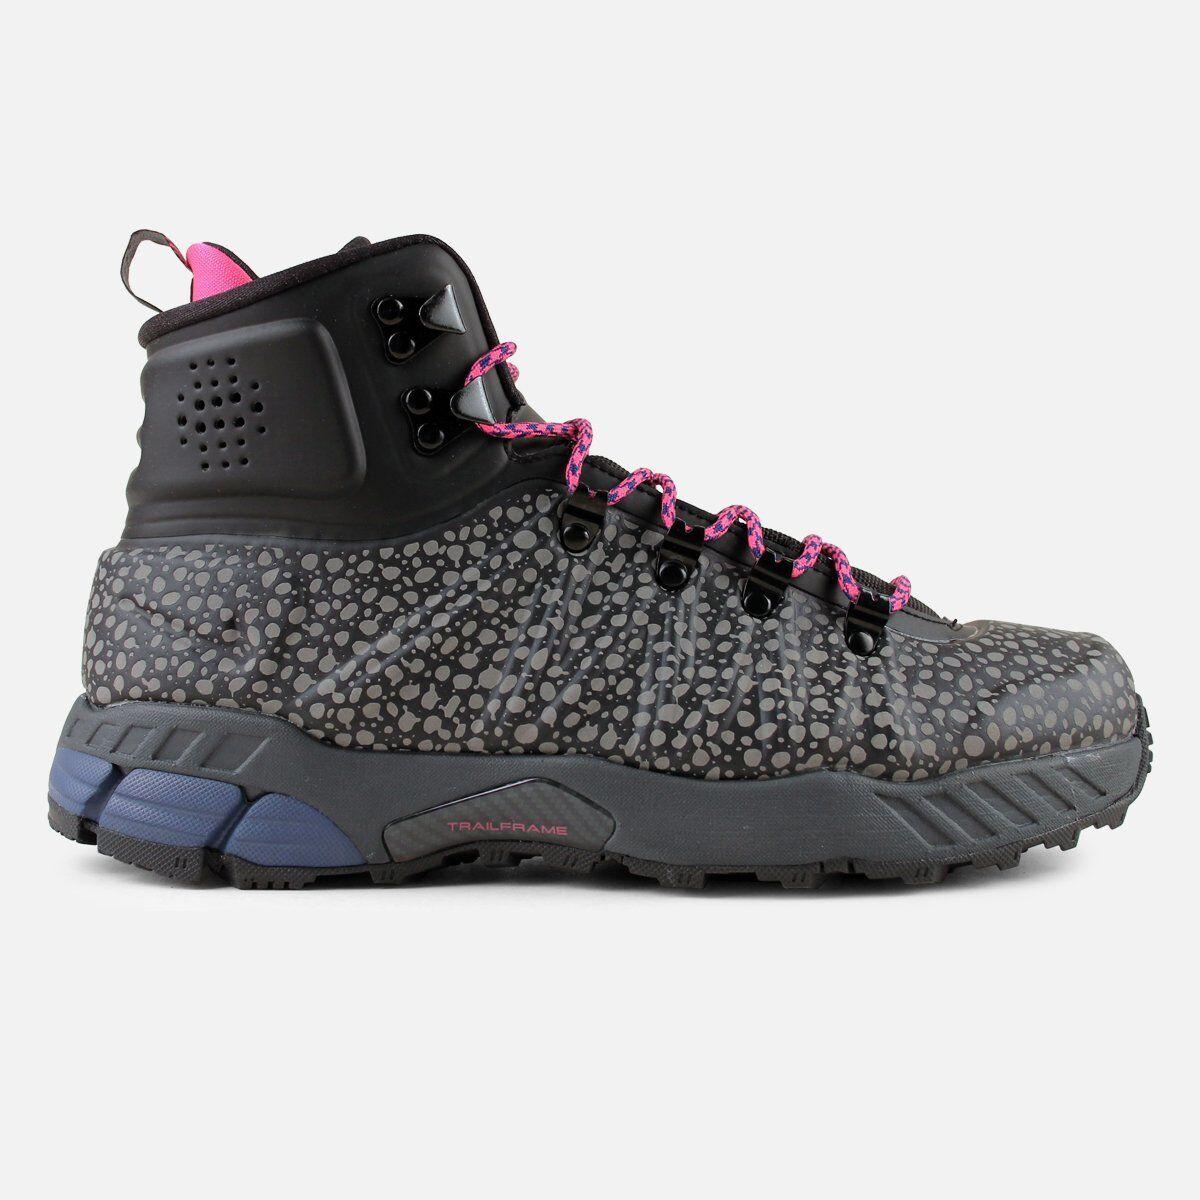 Nike acg zoom meriwether mw posite numero 9.safari foamposite grey foamposite 9.safari 616215-040 b3c074